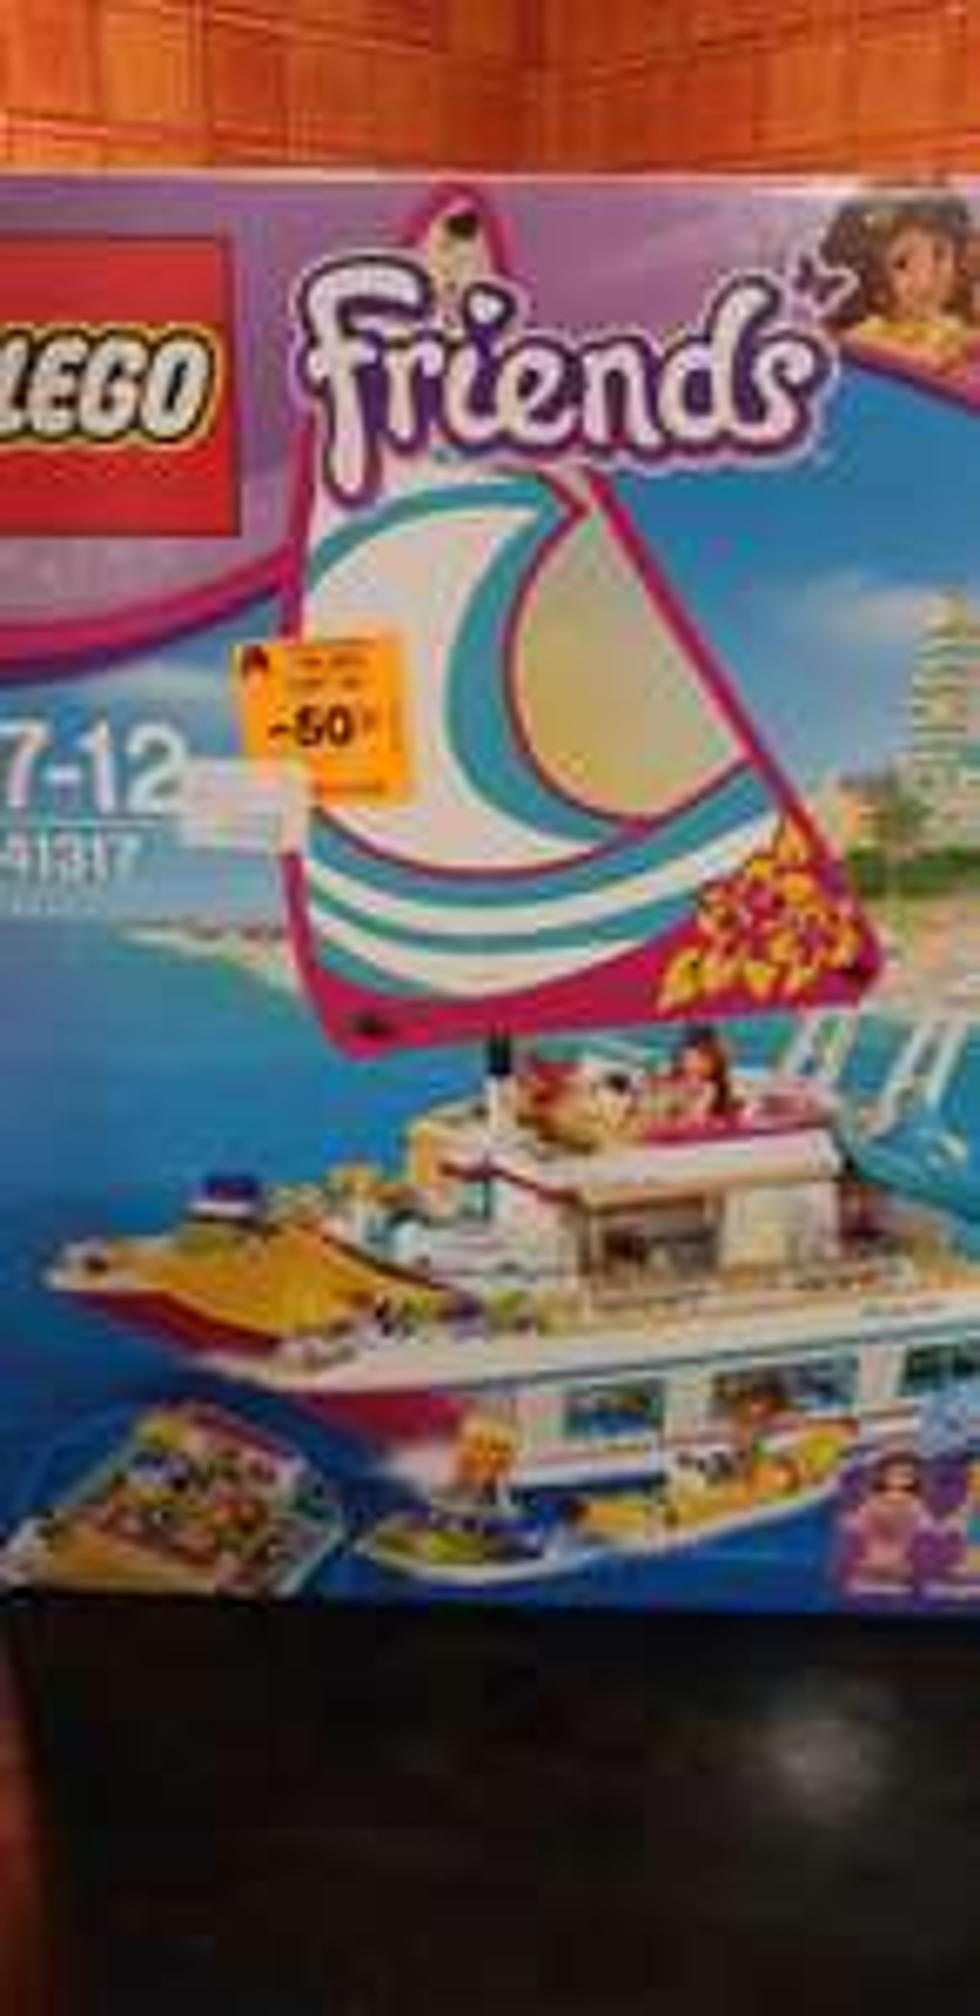 Jouet Lego Friends 41317 - Le catamaran -Faches-Thumesnil(59)